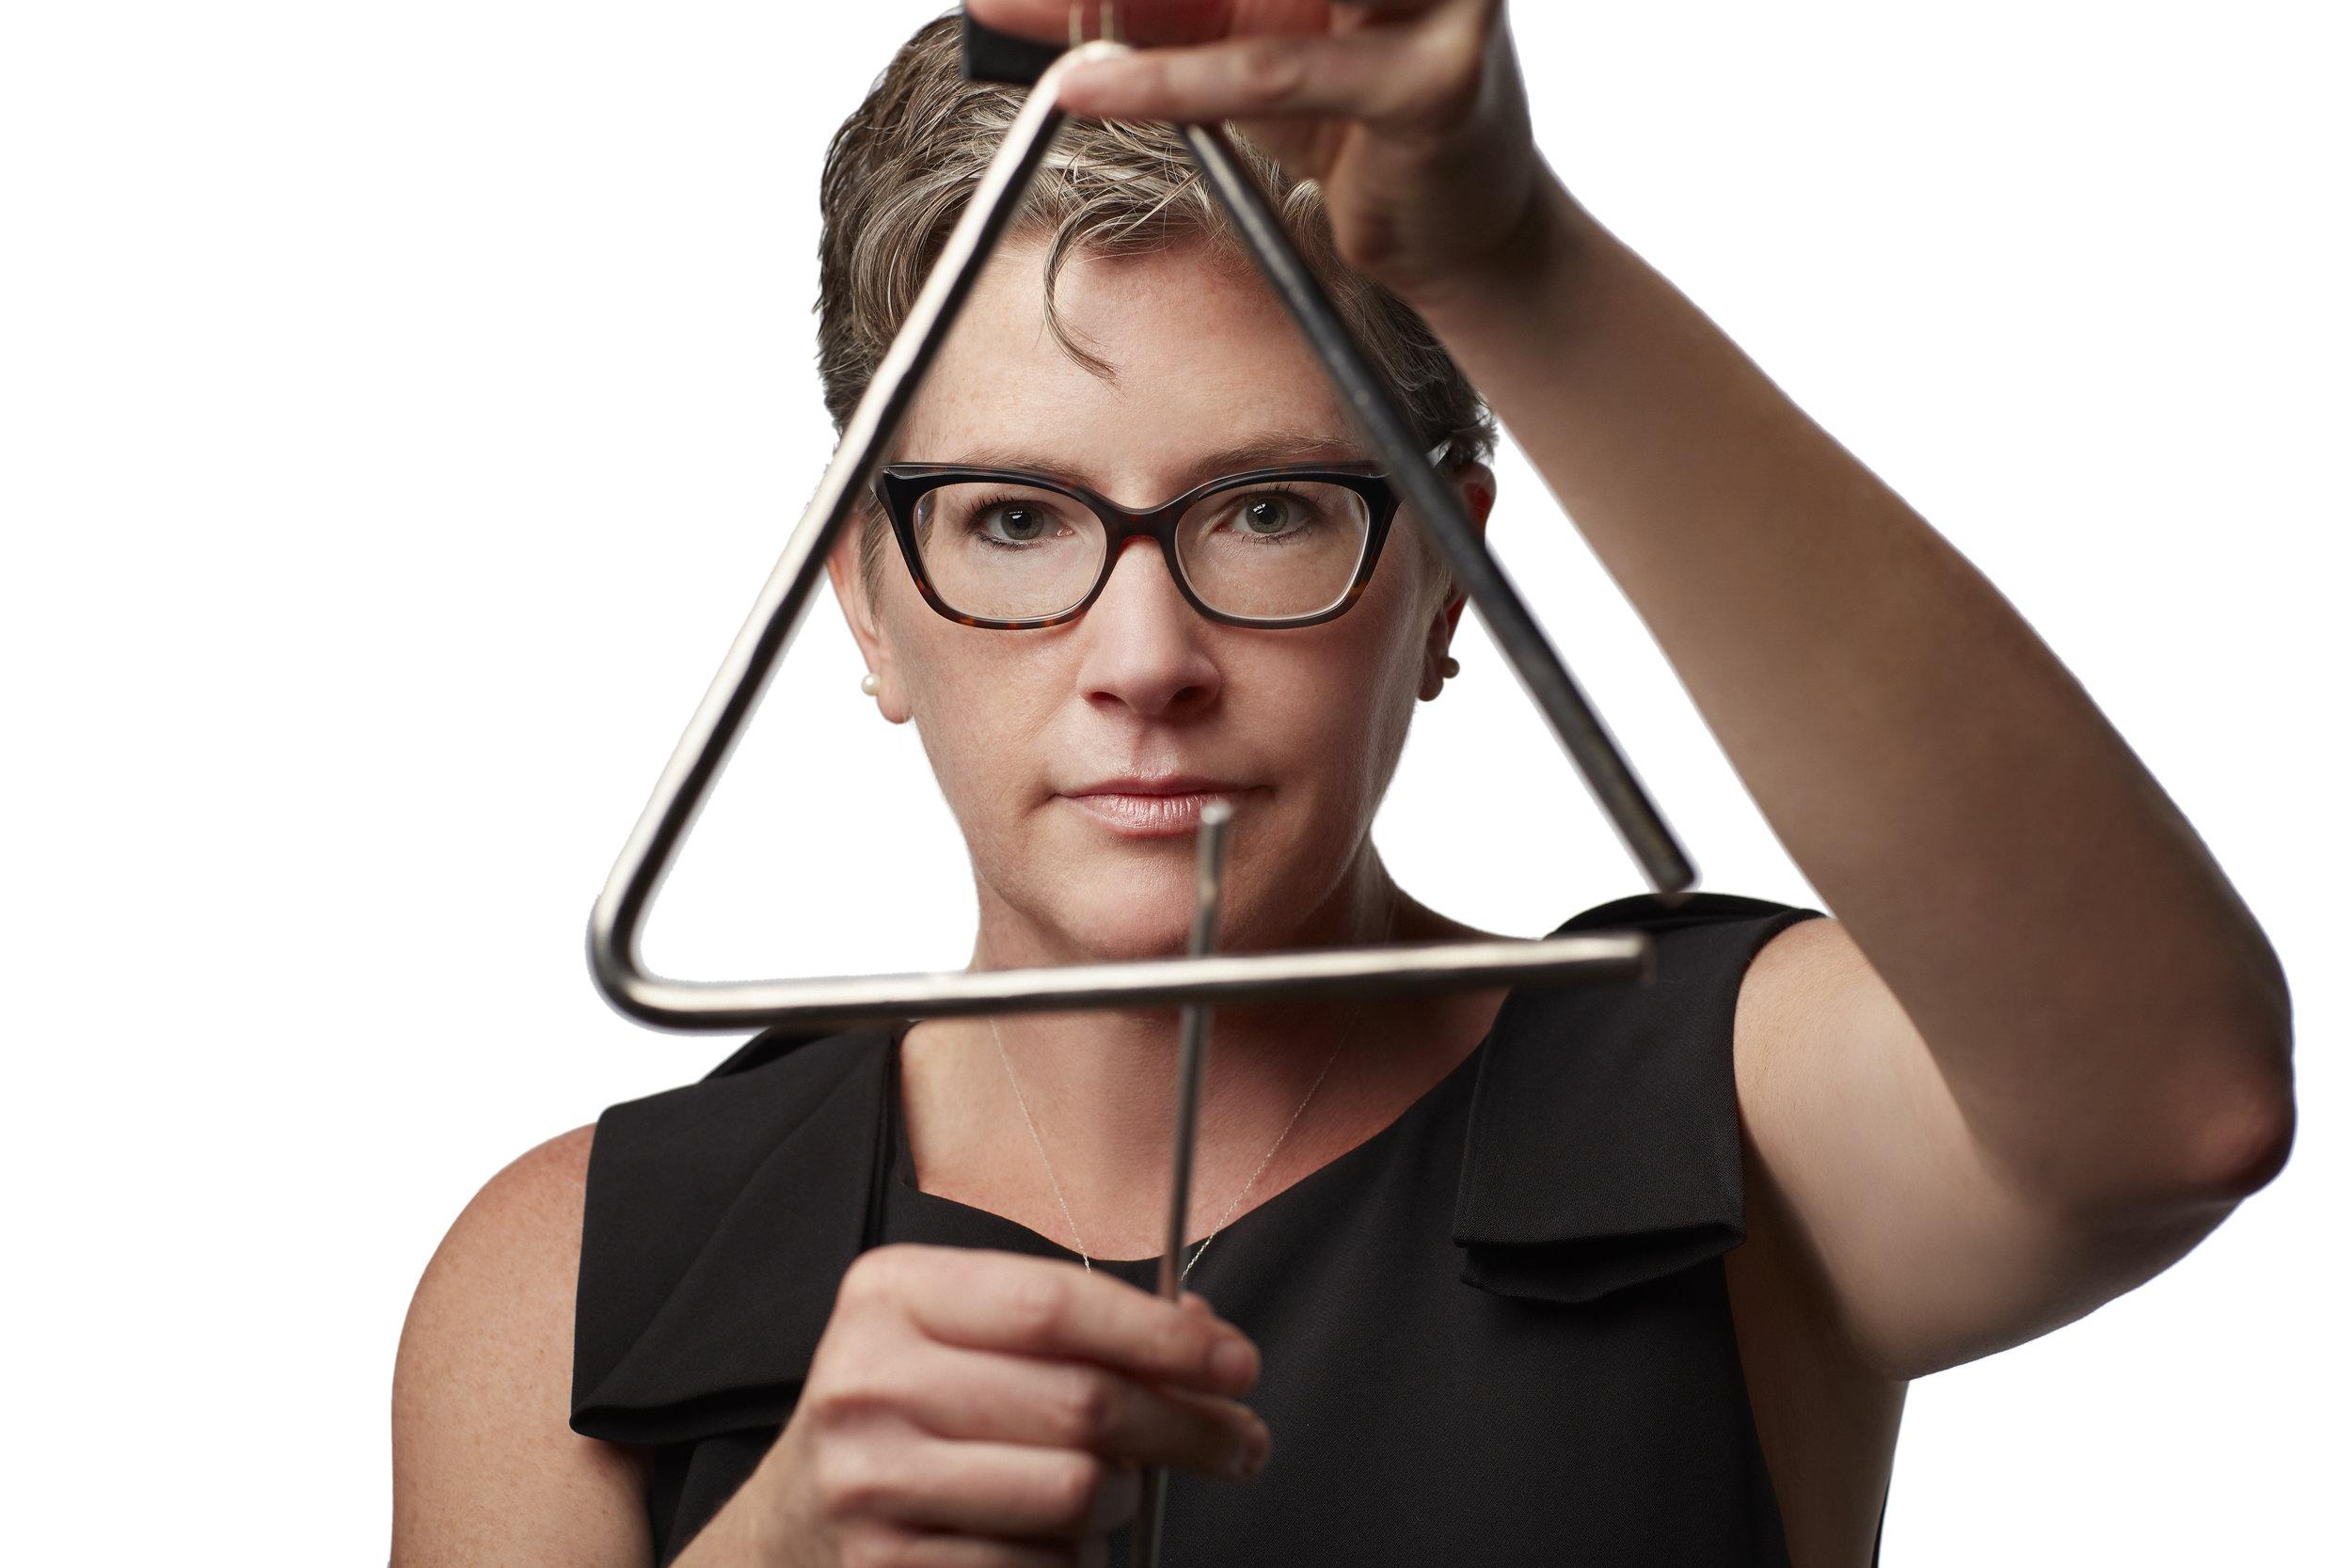 Dr. Julie Hill - Musician, Educator, Leader